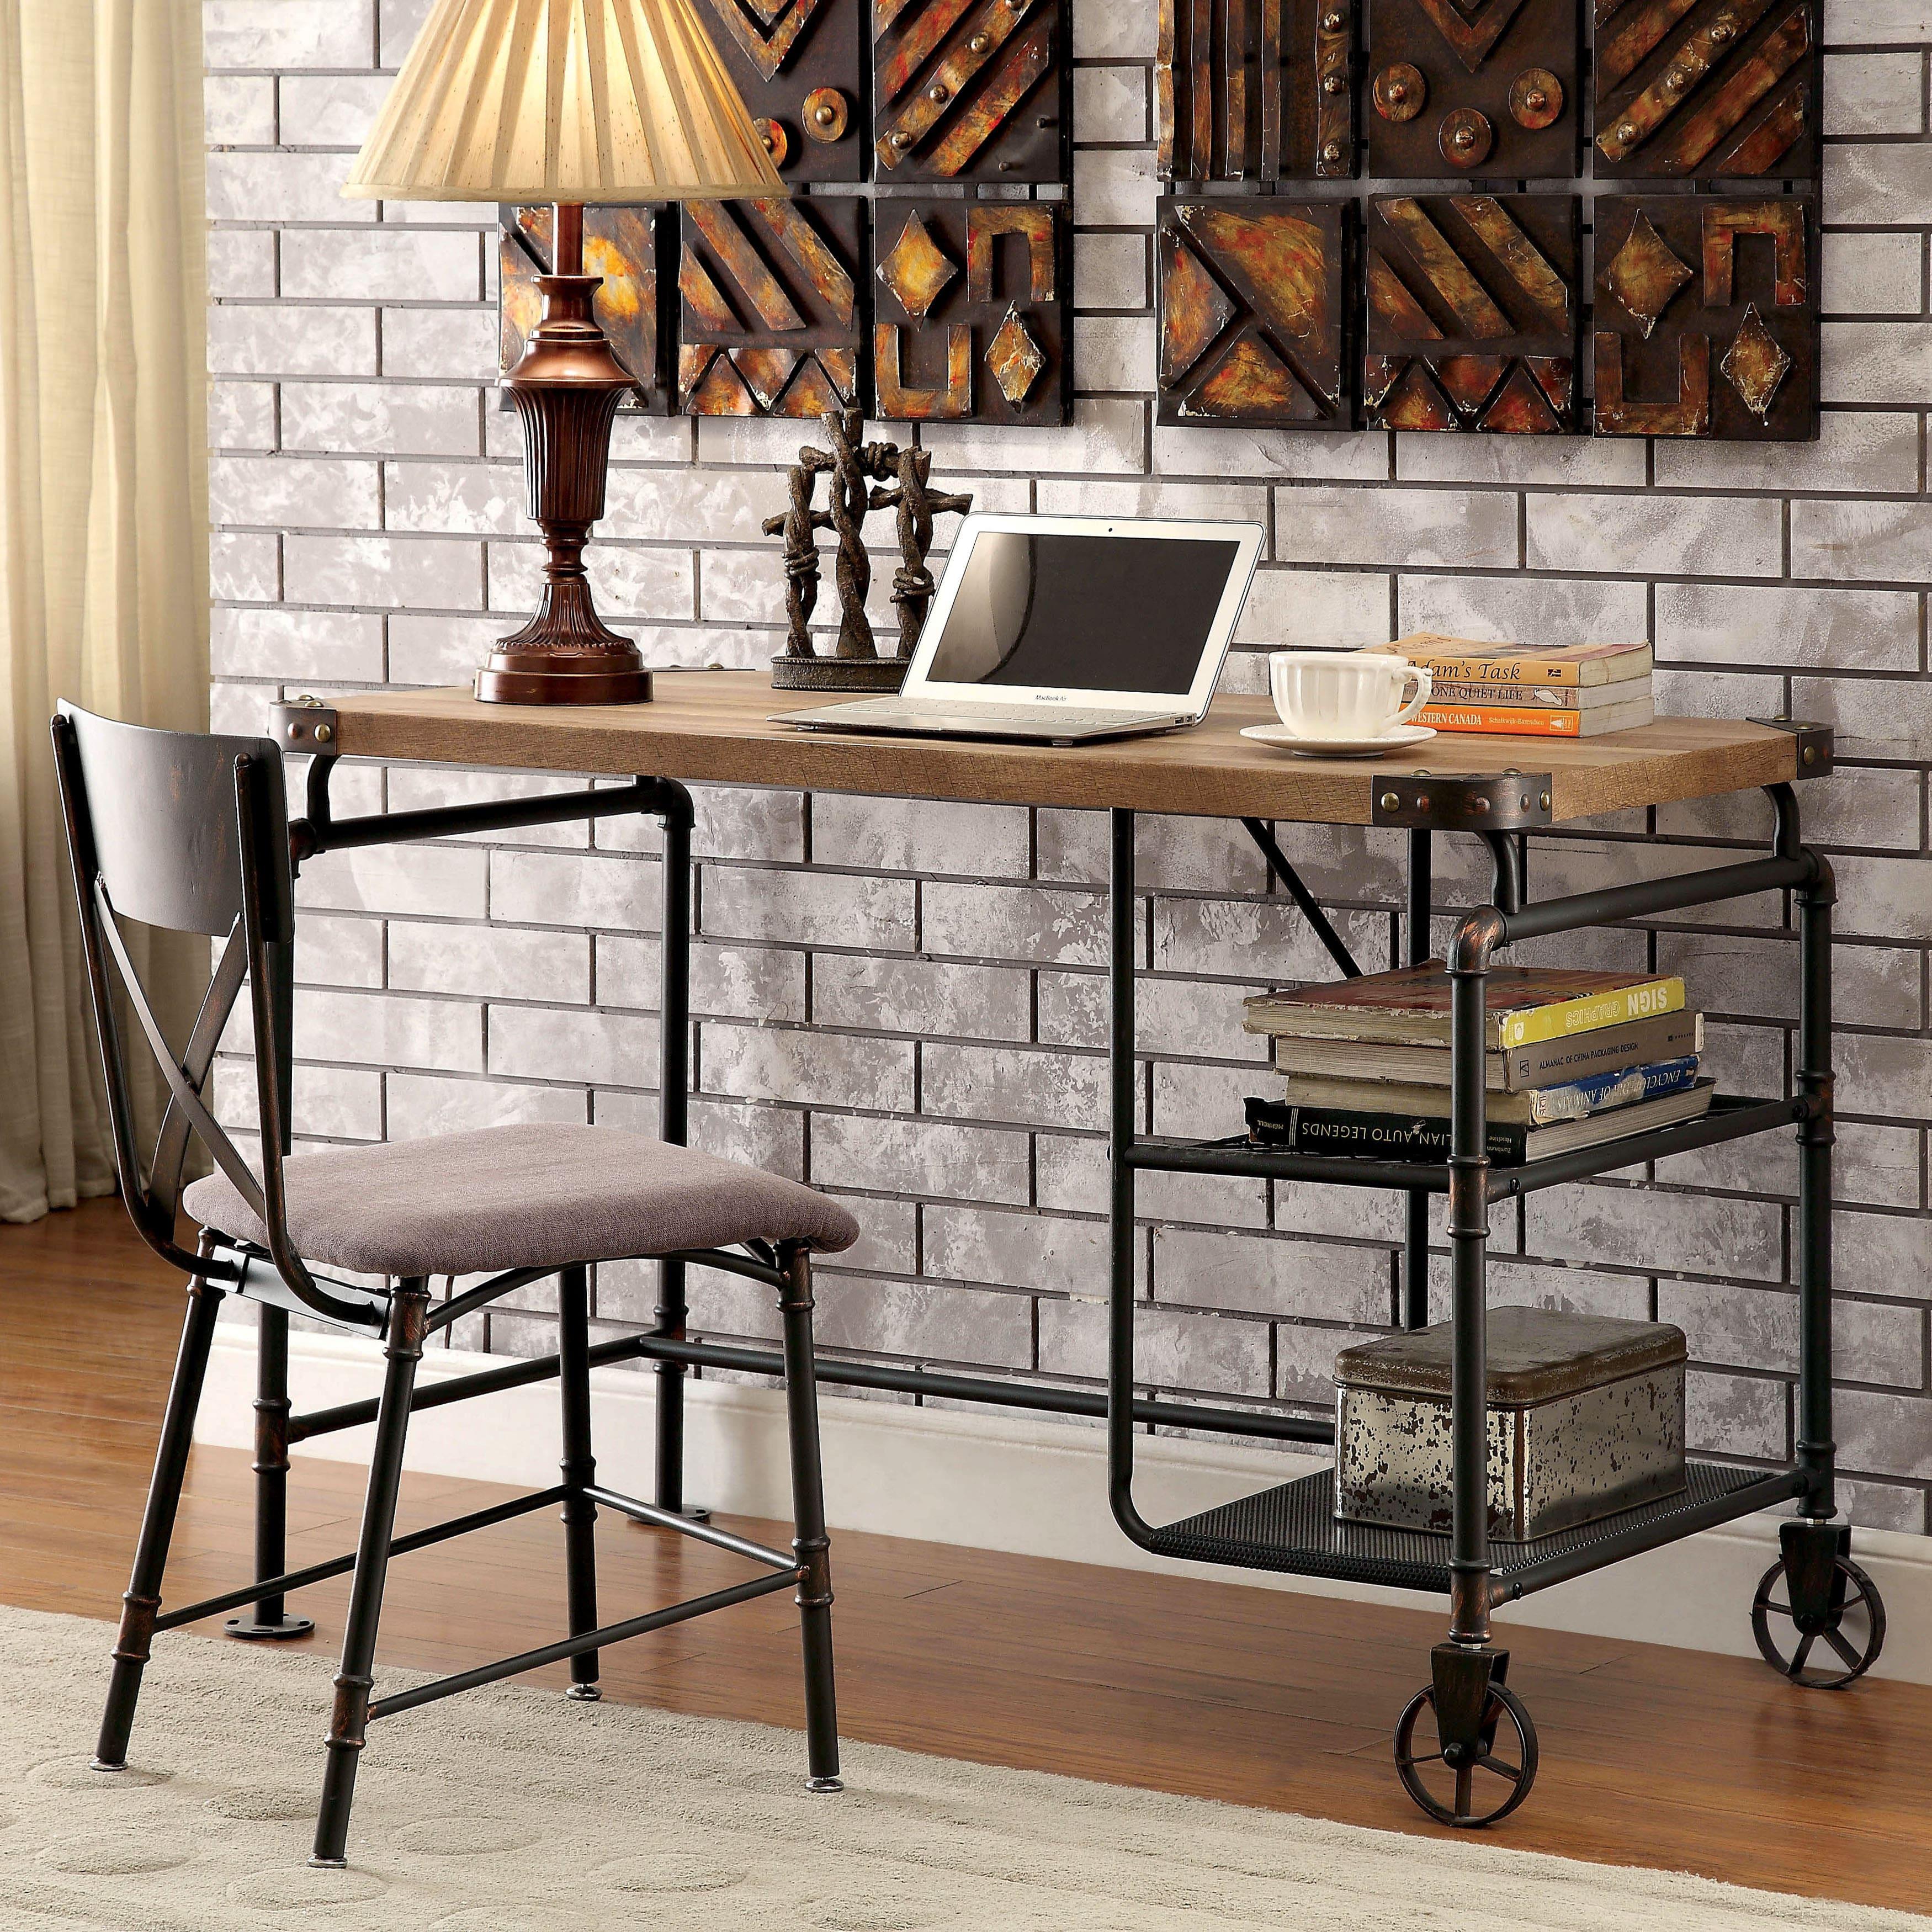 Buy Desks & Computer Tables Online At Overstock.com